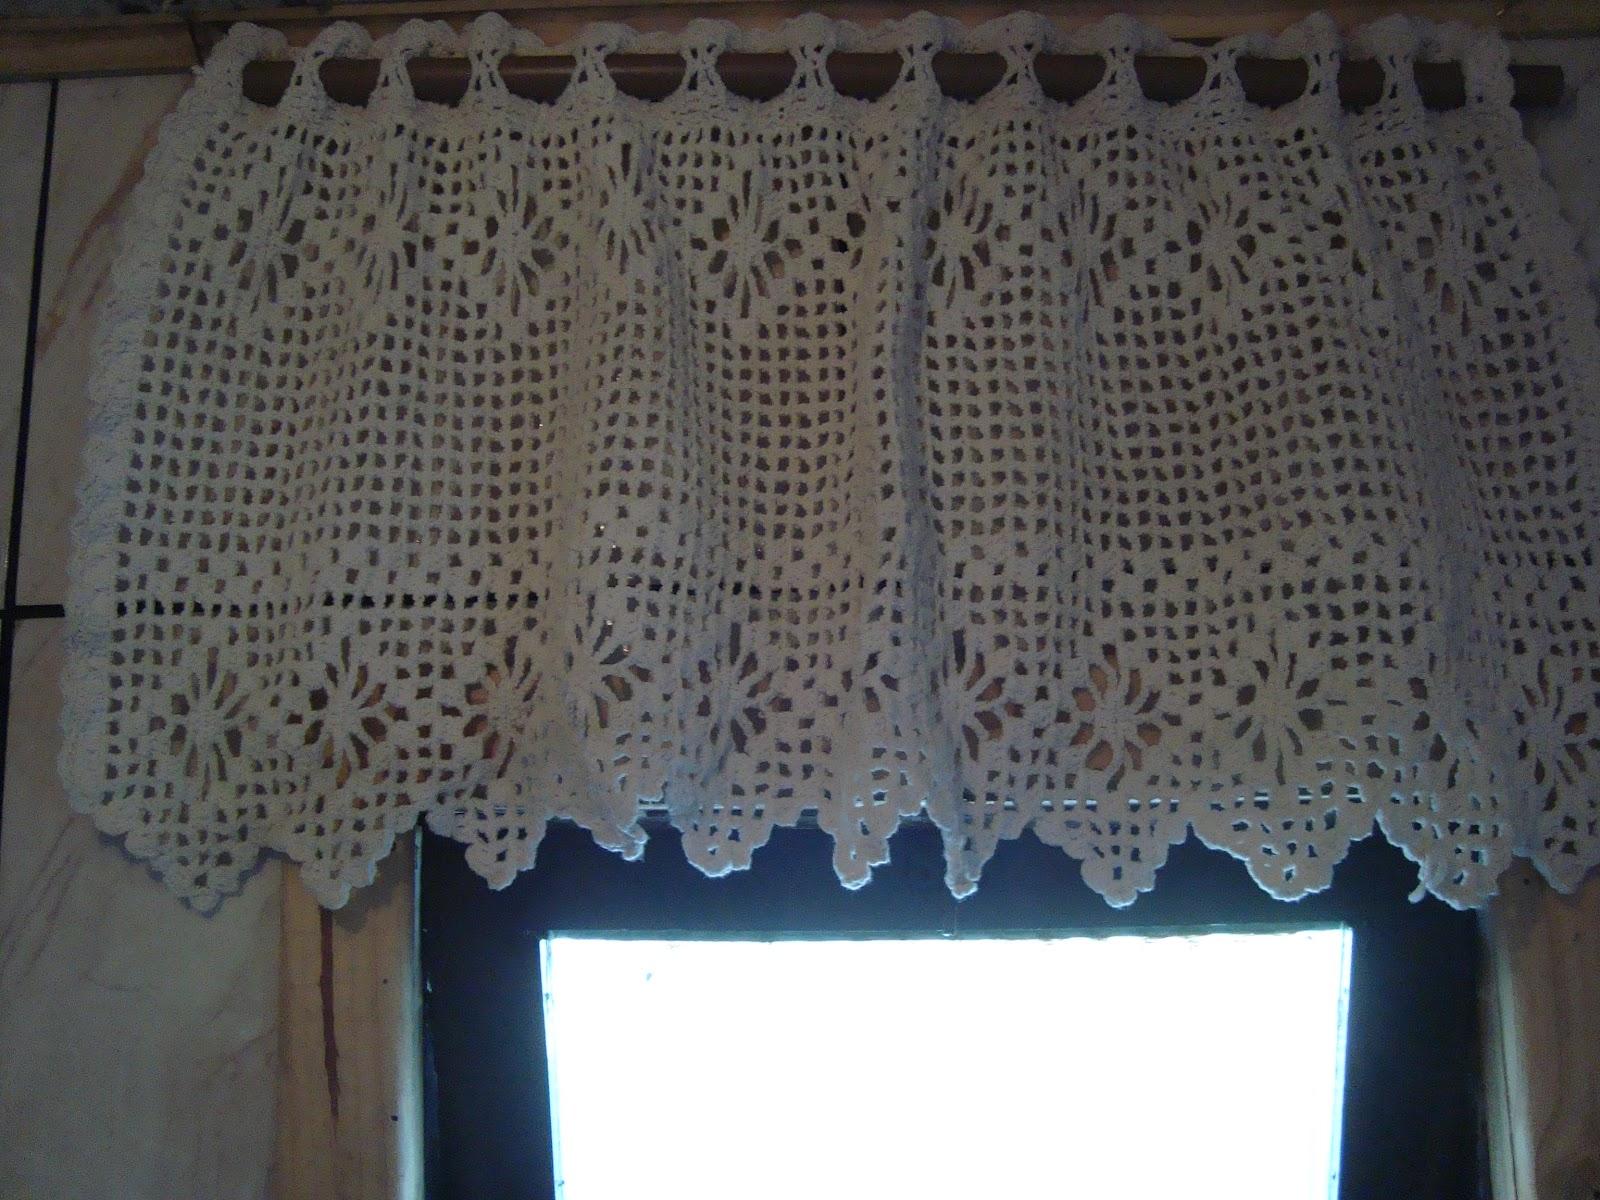 Artes Arteiras: Cortina de crochê para janela banheiro #3C758F 1600x1200 Banheiro Com Cortina Na Janela